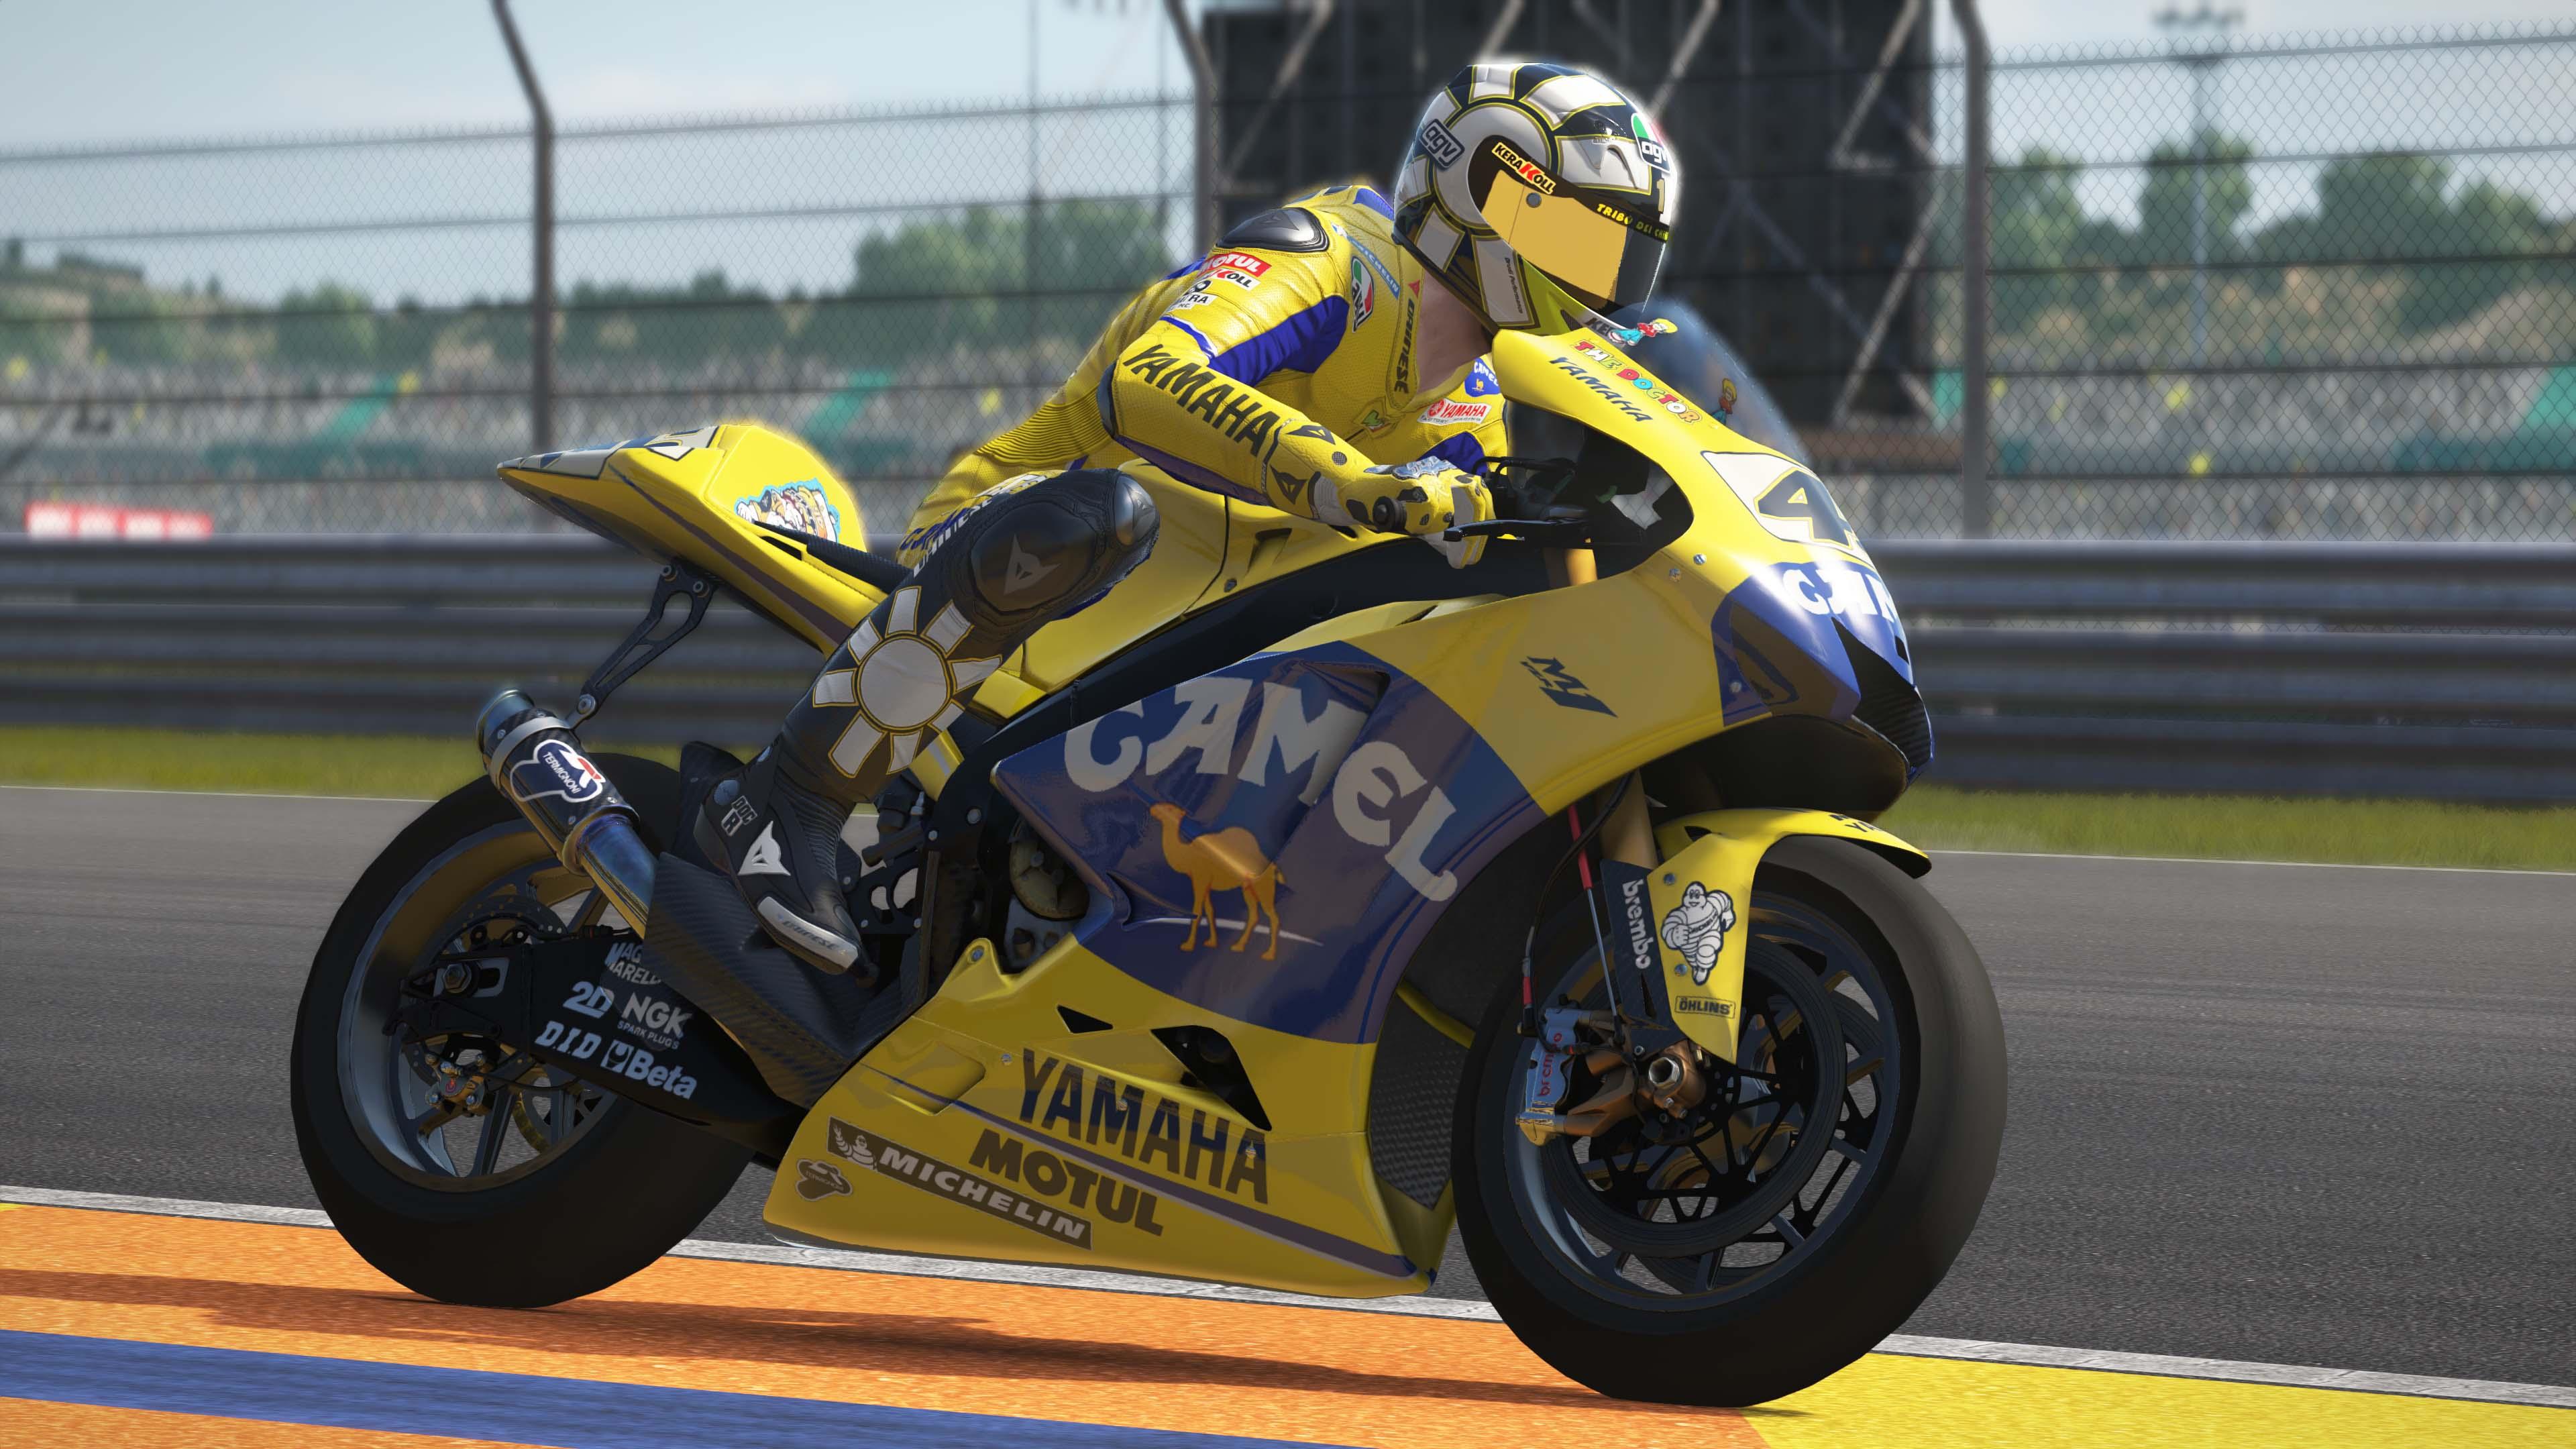 Valentino Rossi 2006 (Camel) | RaceDepartment - Latest Formula 1, Motorsport, and Sim Racing News